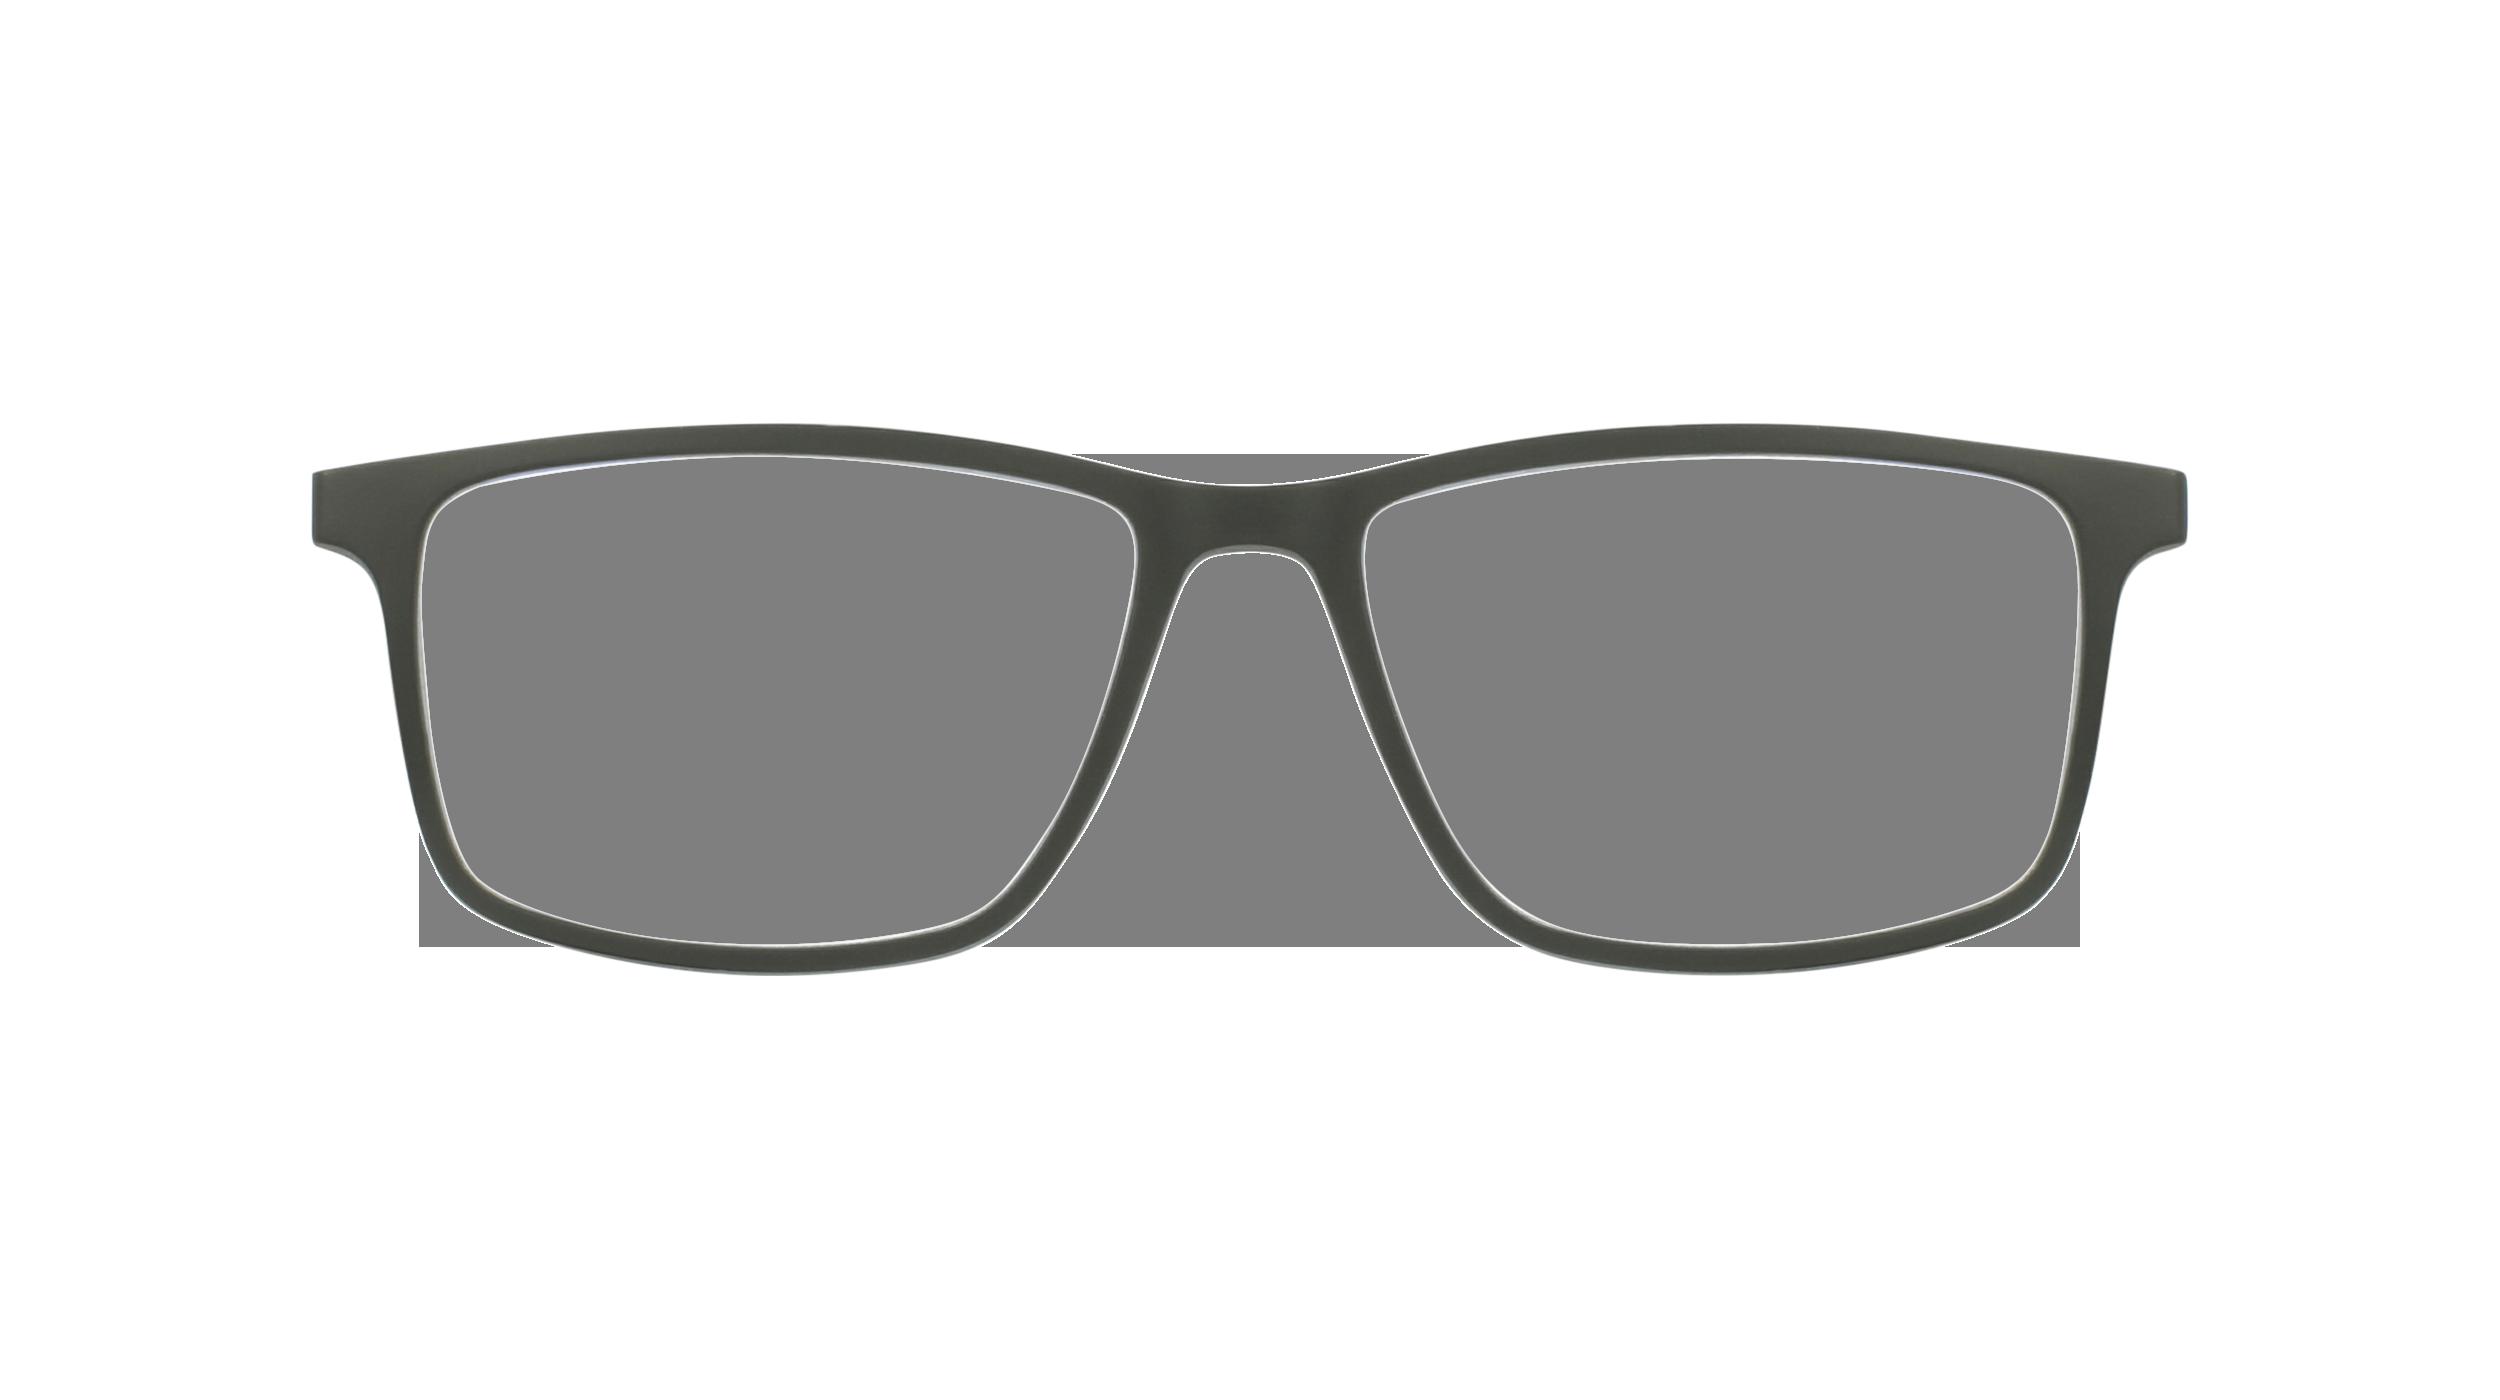 afflelou/france/products/smart_clip/clips_glasses/07630036457047.png